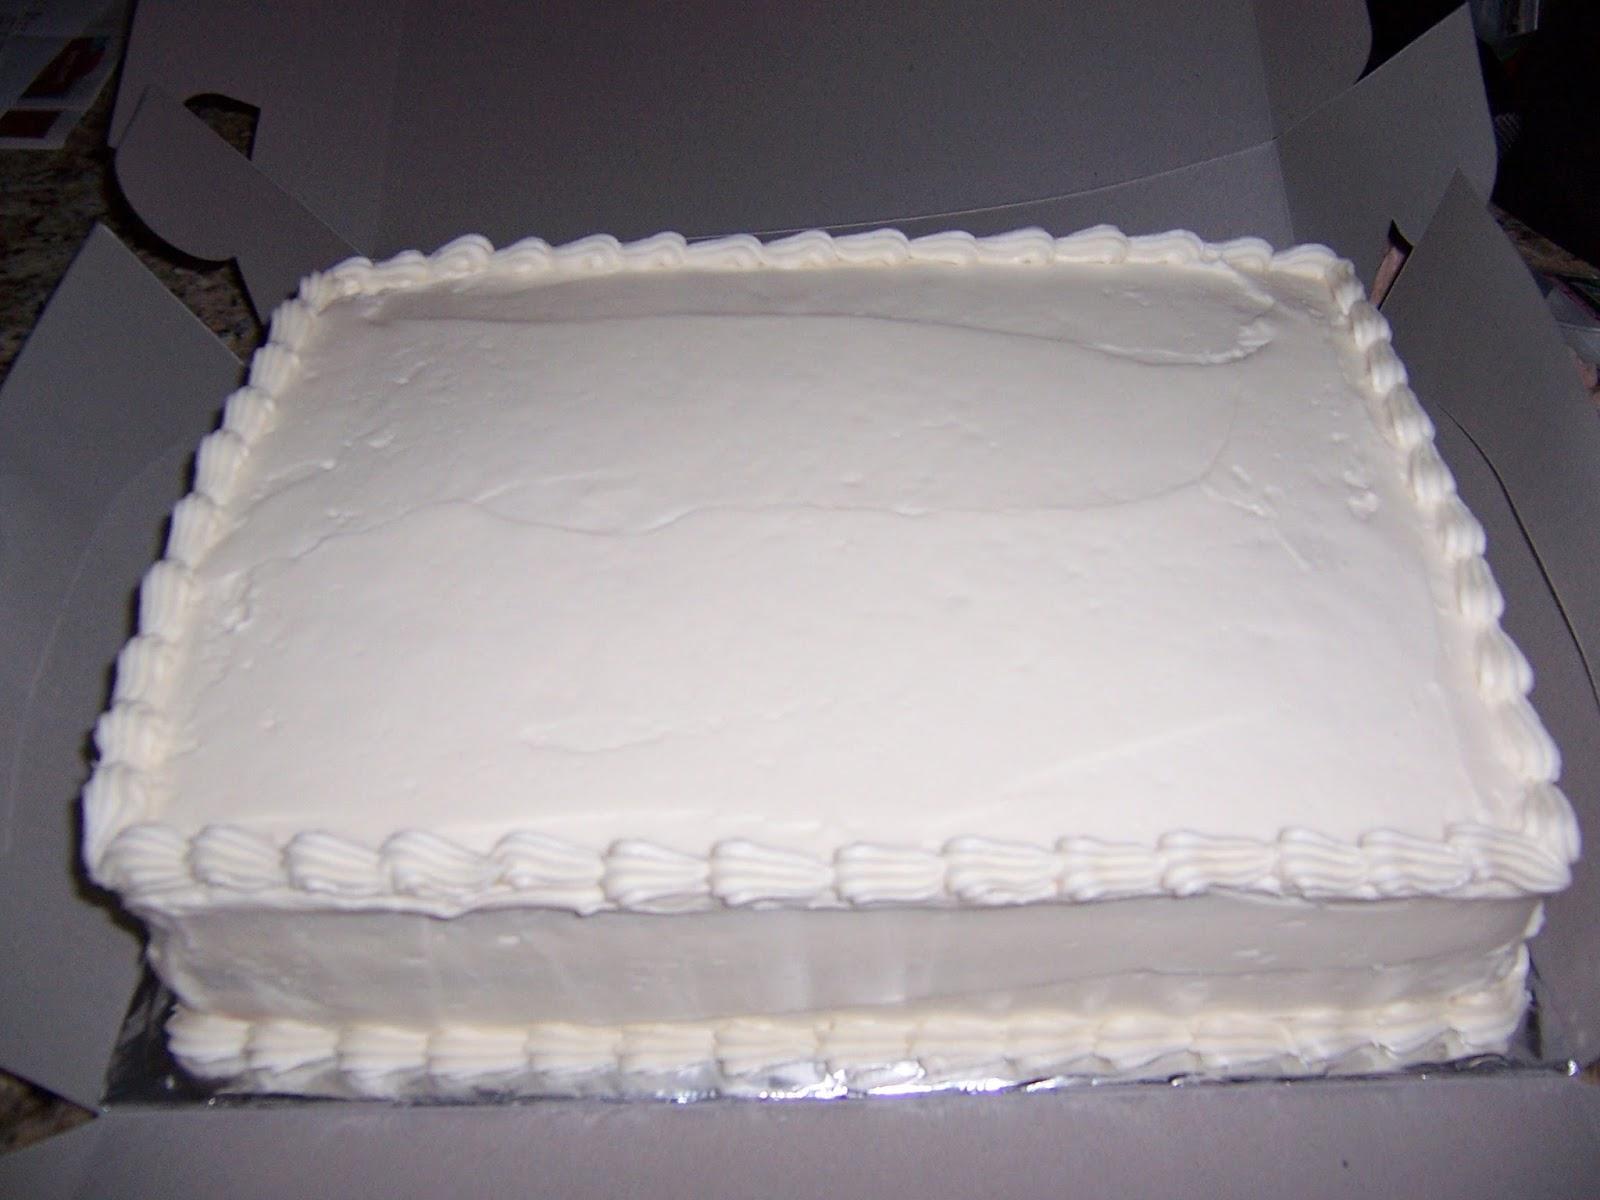 Plain white sheet cake